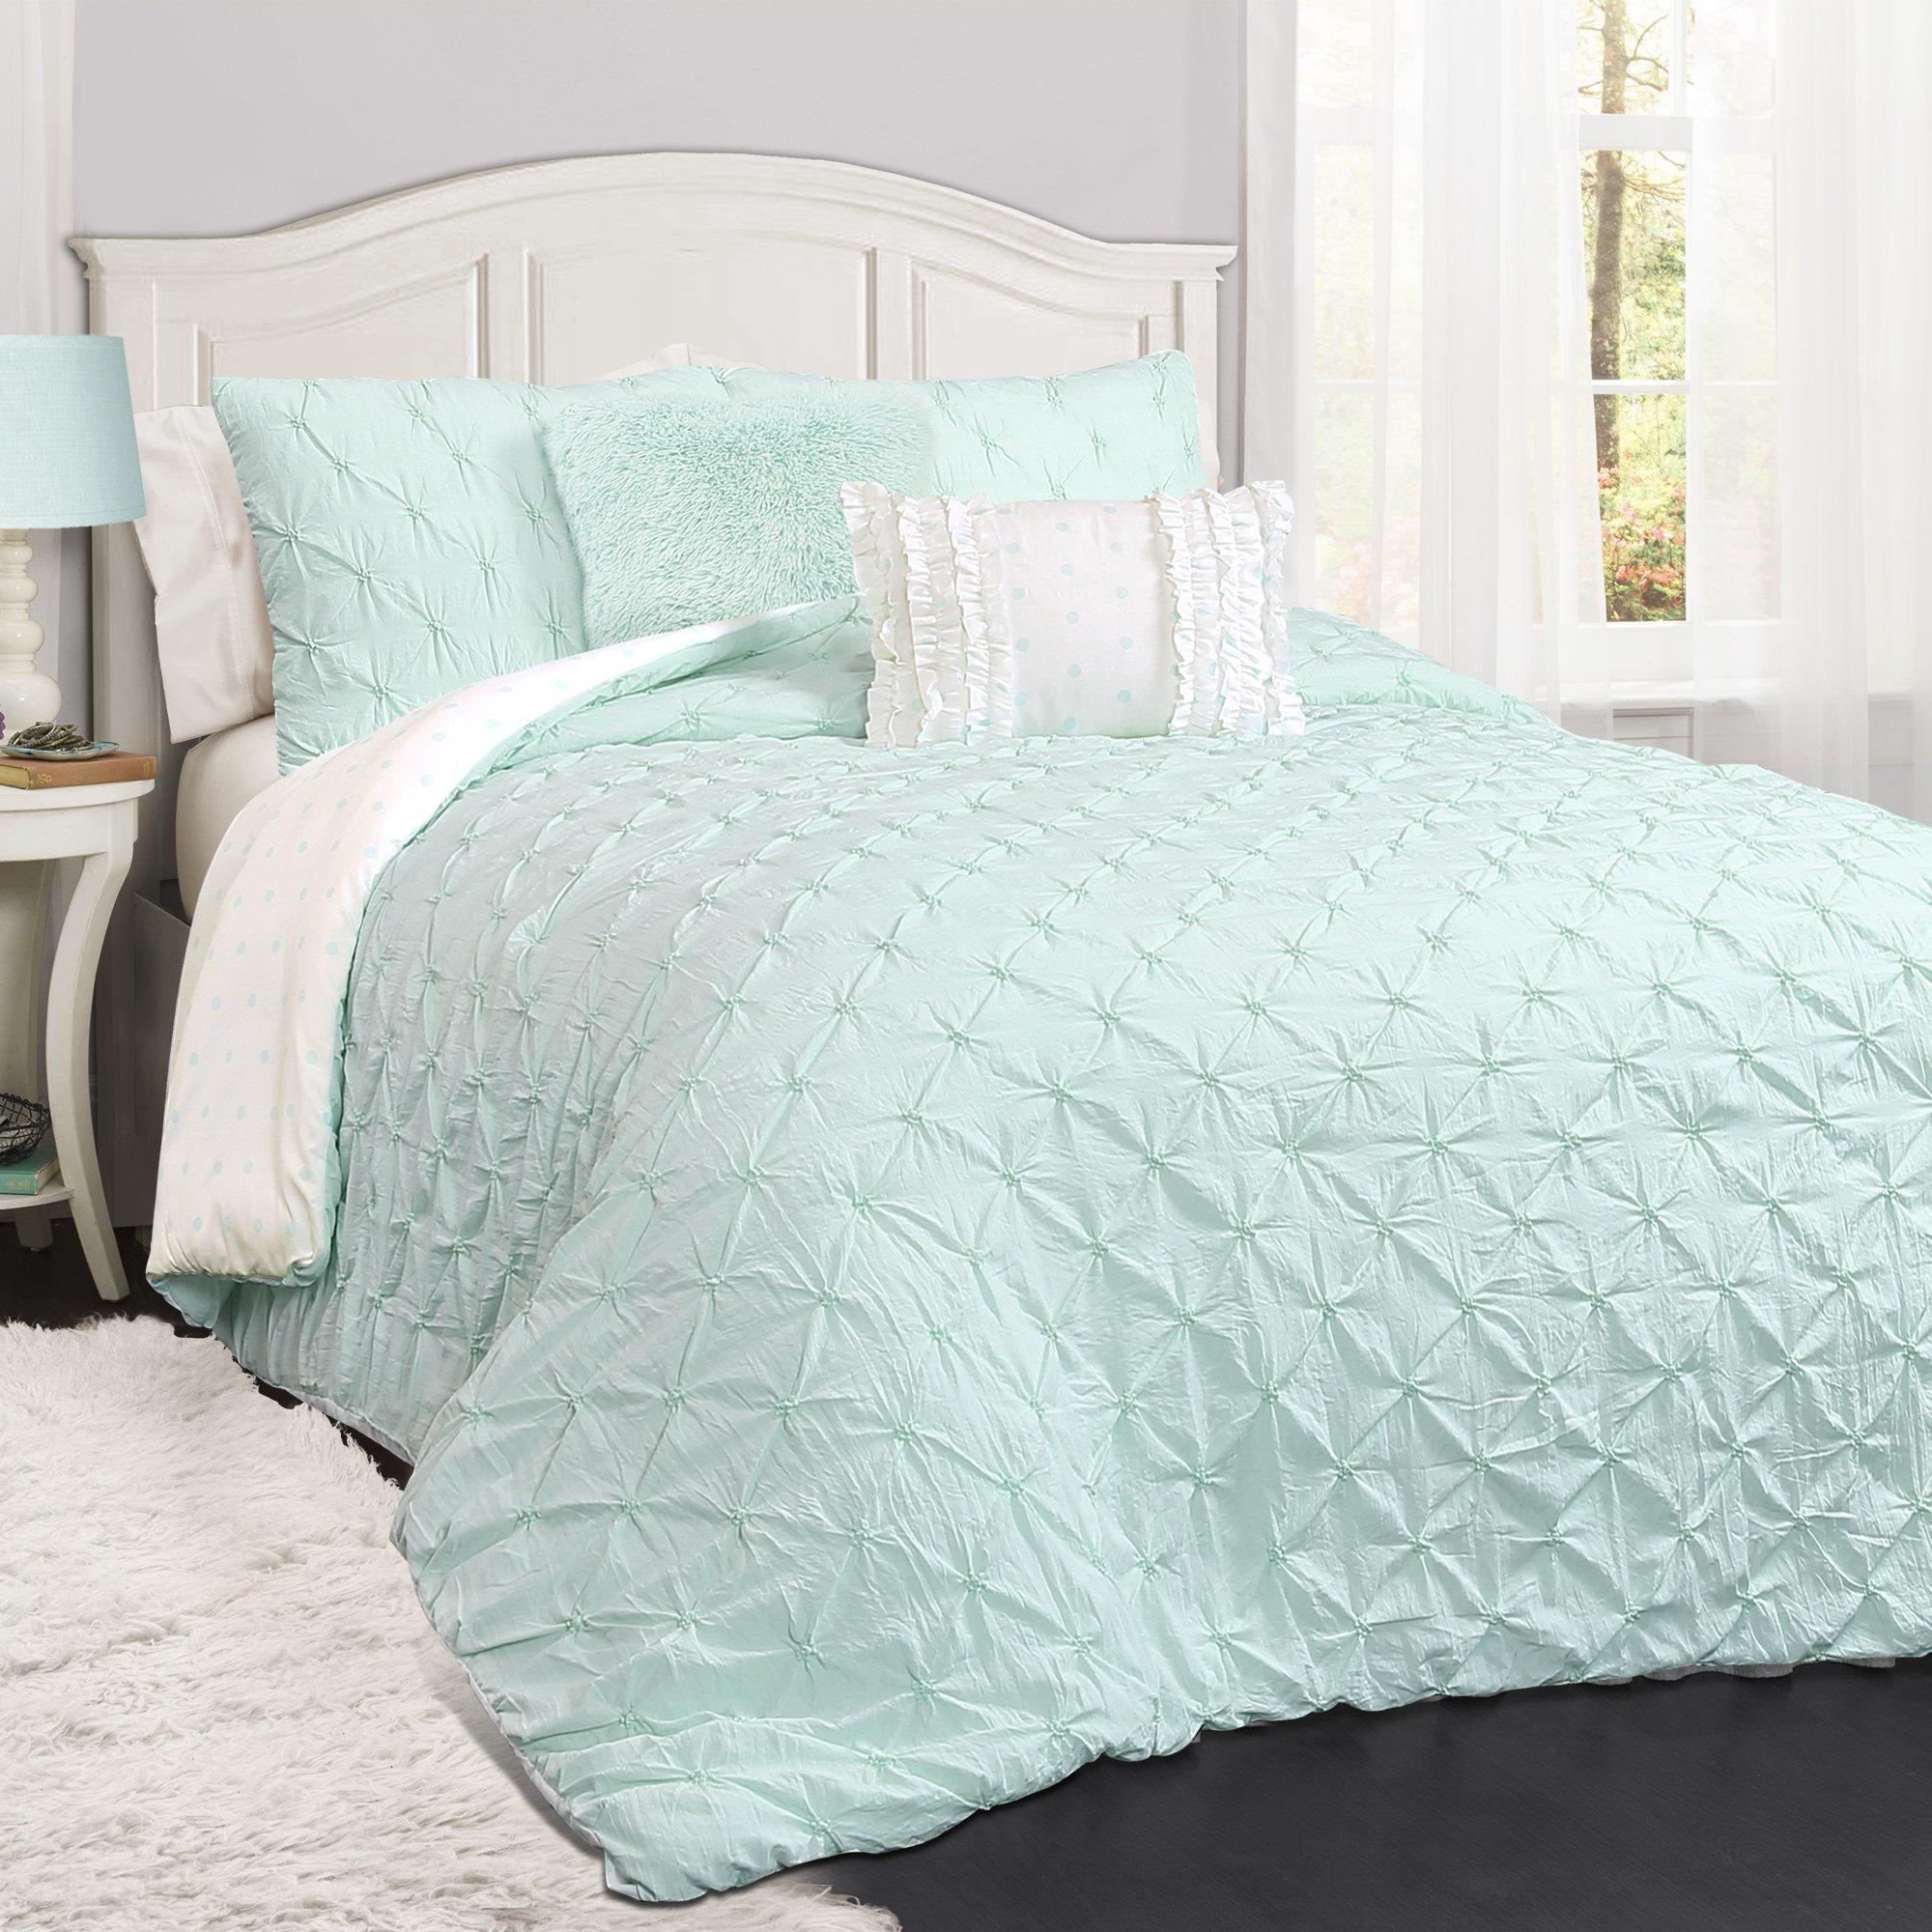 Lush Decor Lush Décor Ravello Pintuck 4 Piece Comforter Set, Twin, Light Aqua by Lush Decor